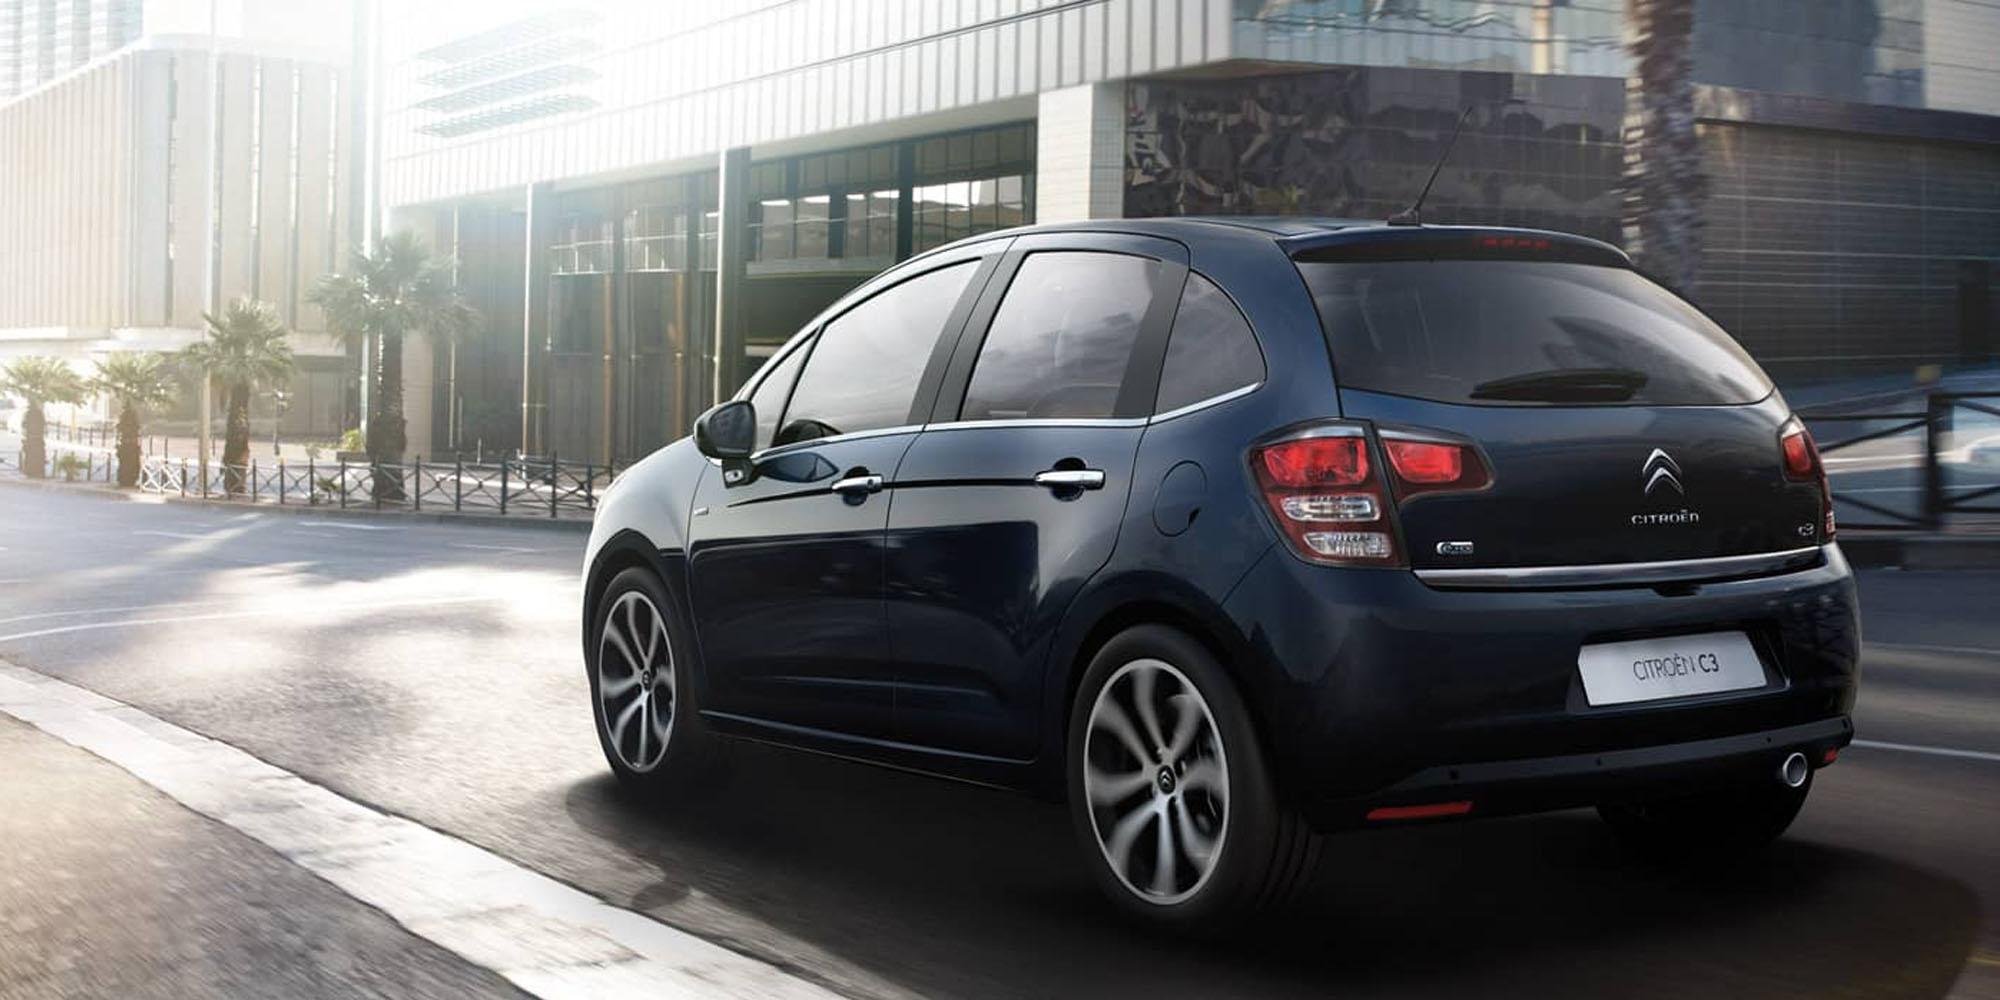 Citroën Contract Motoring